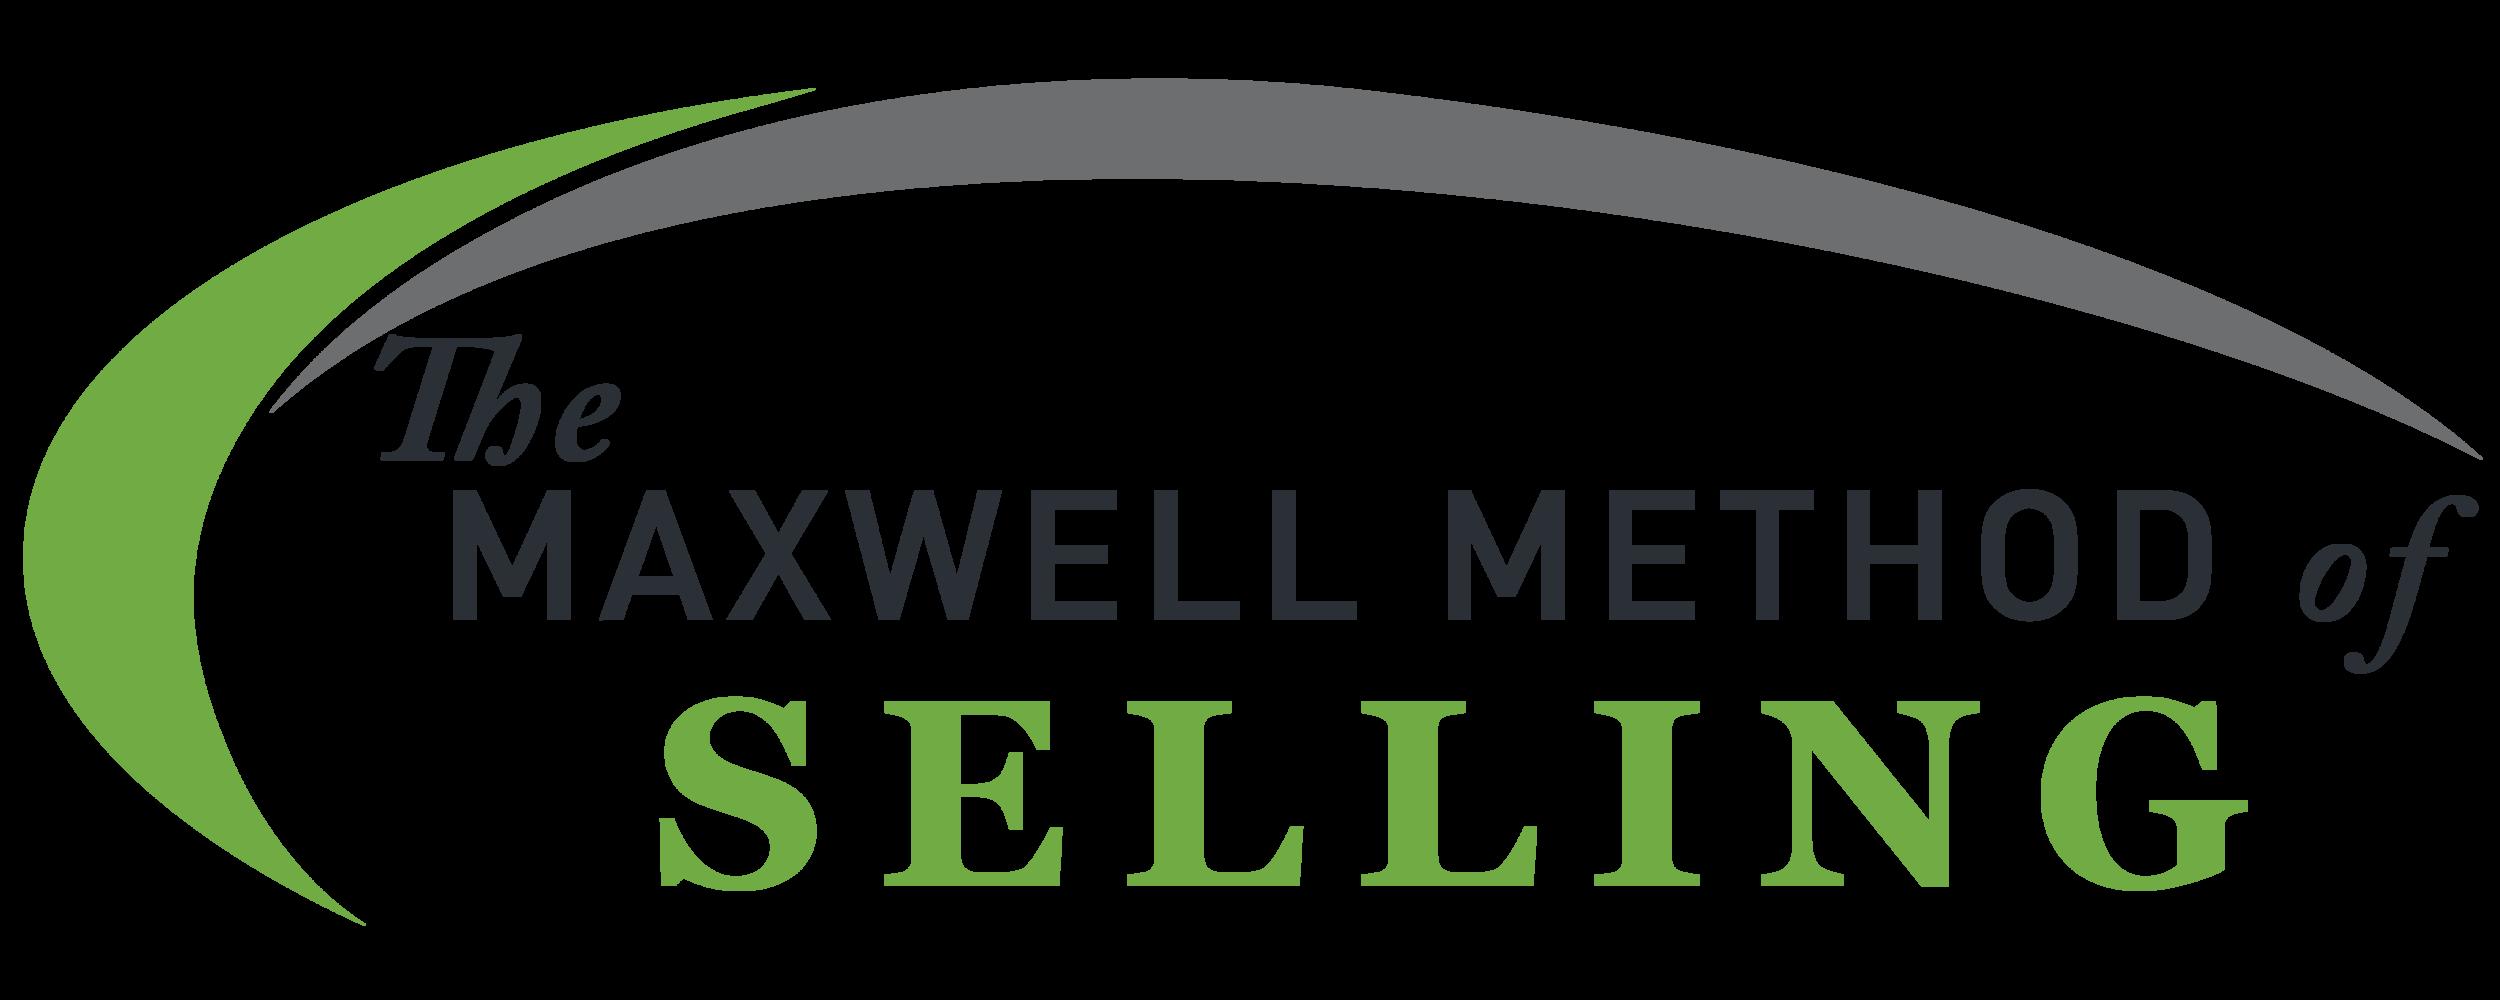 minneapolis-Maxwell-Method-Selling-sales-training.png